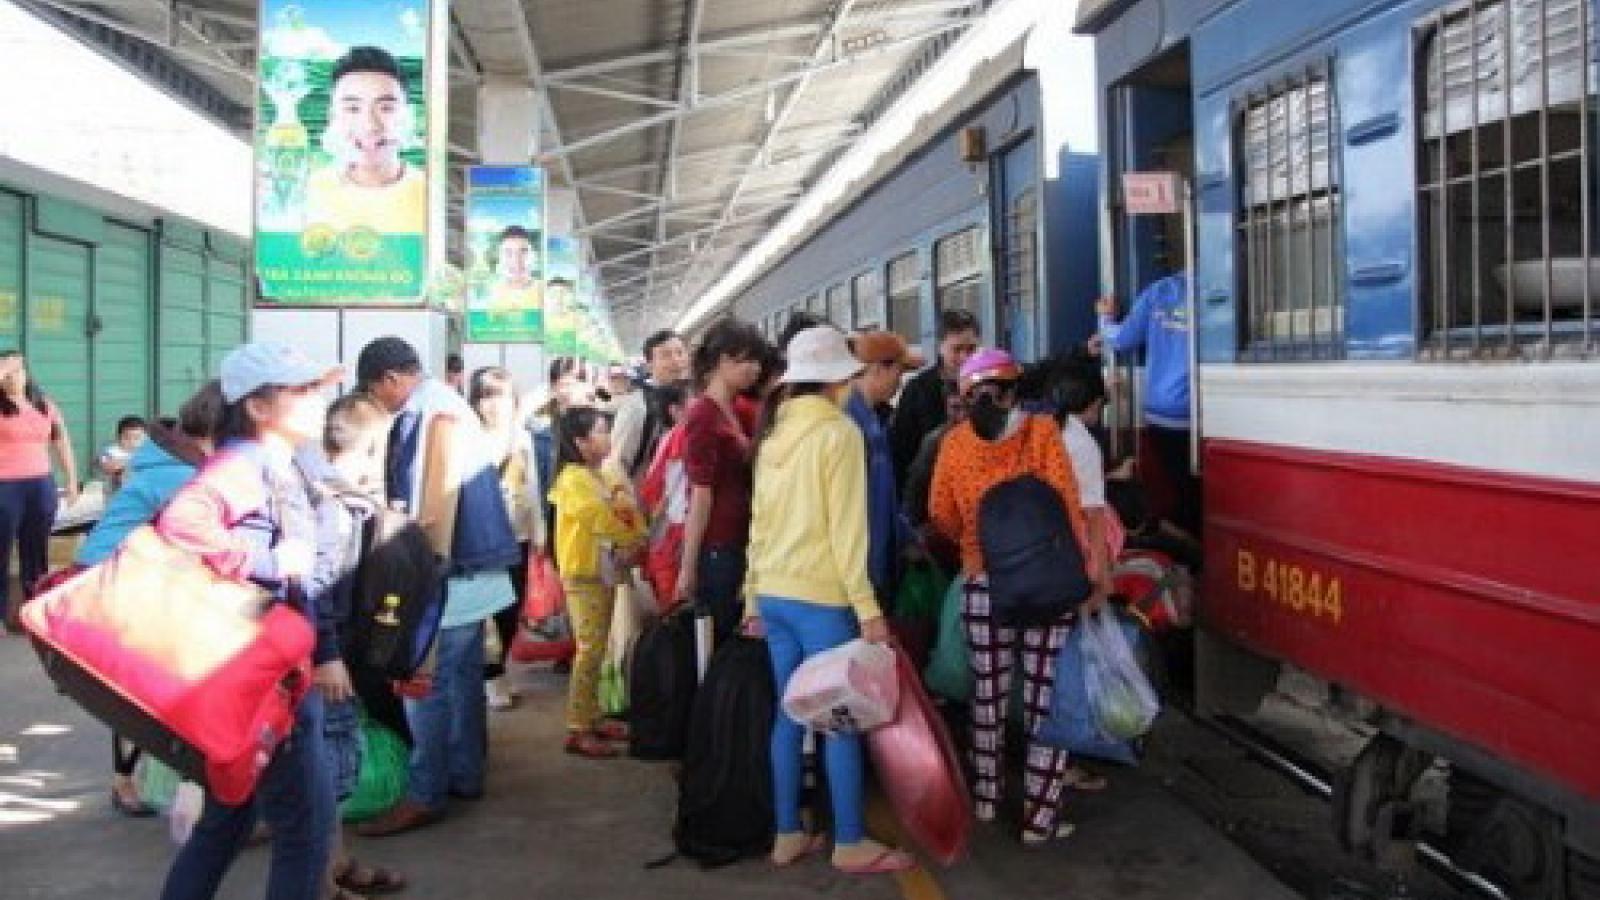 Saigon Railways offering up to 50% off train tickets